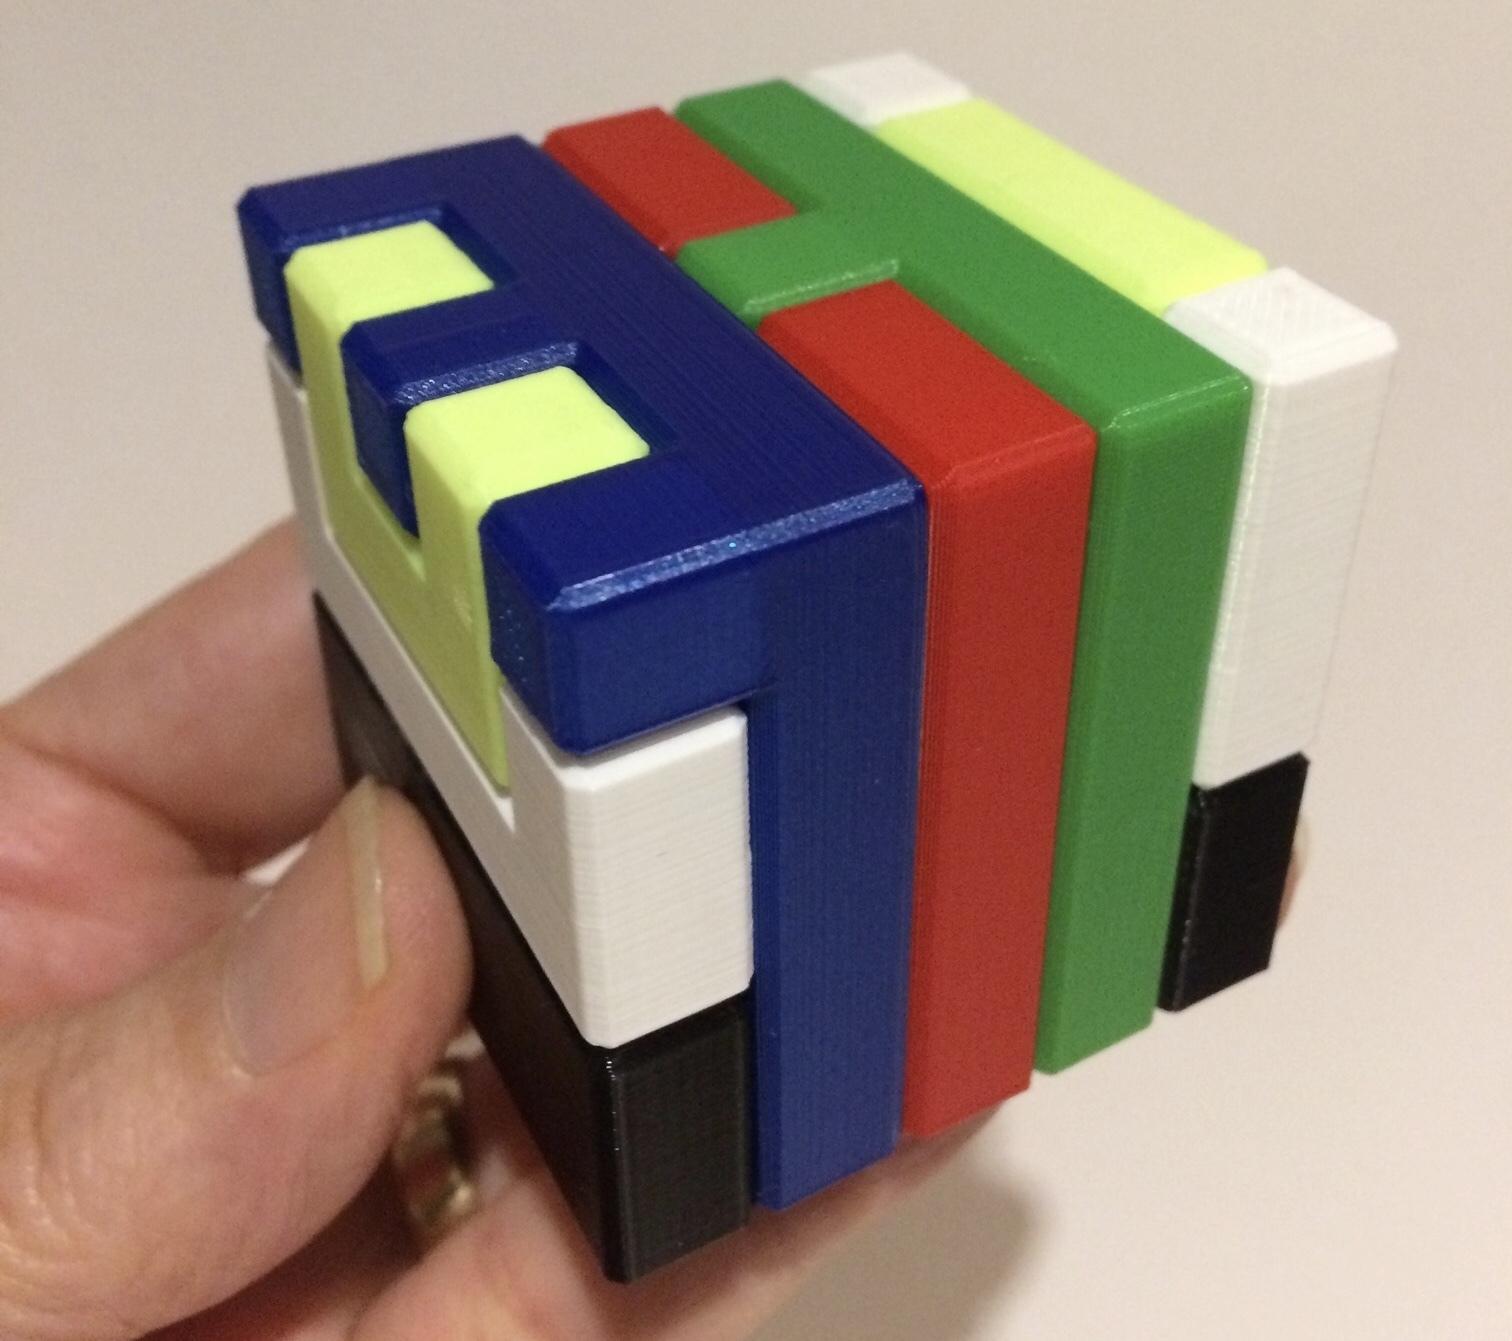 3D Printed Printable Interlocking Puzzle #4 - Level 11Richgain - 3D Printable Puzzles Cube